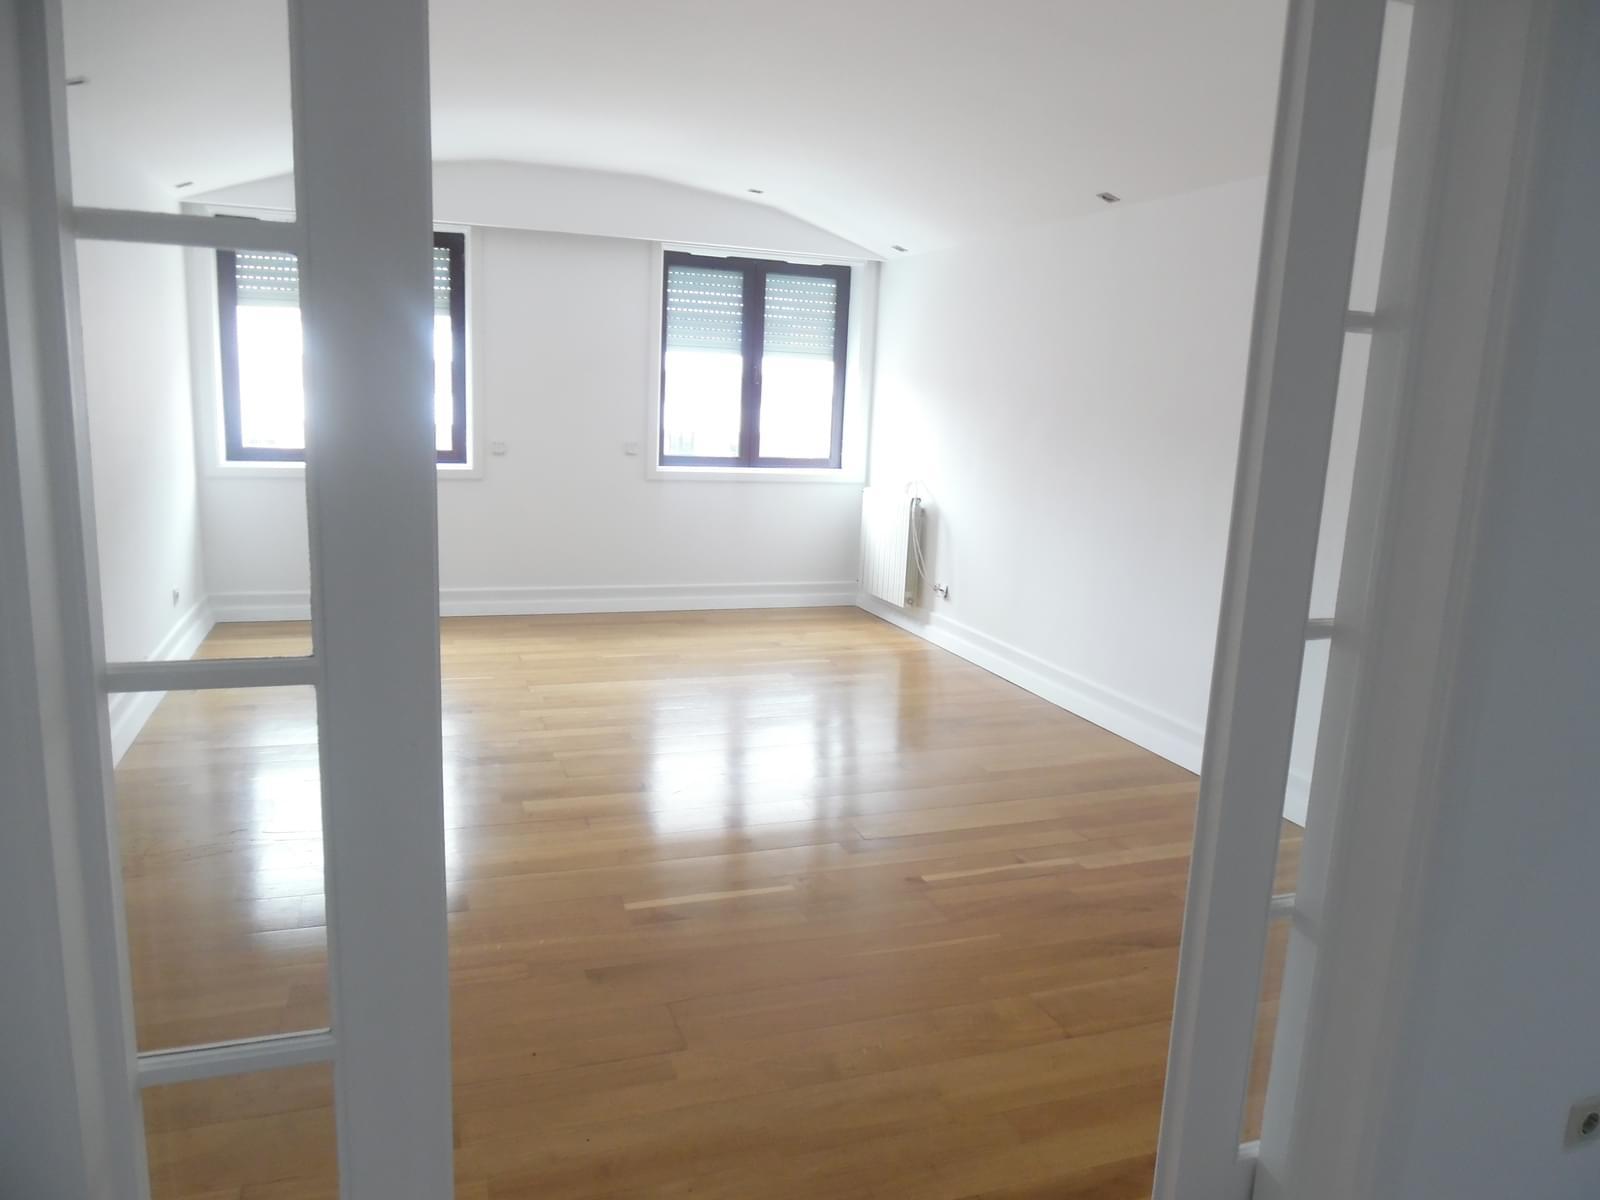 pf17637-apartamento-t2-lisboa-4eb10b67-8345-492c-a860-cdc2b65031fb